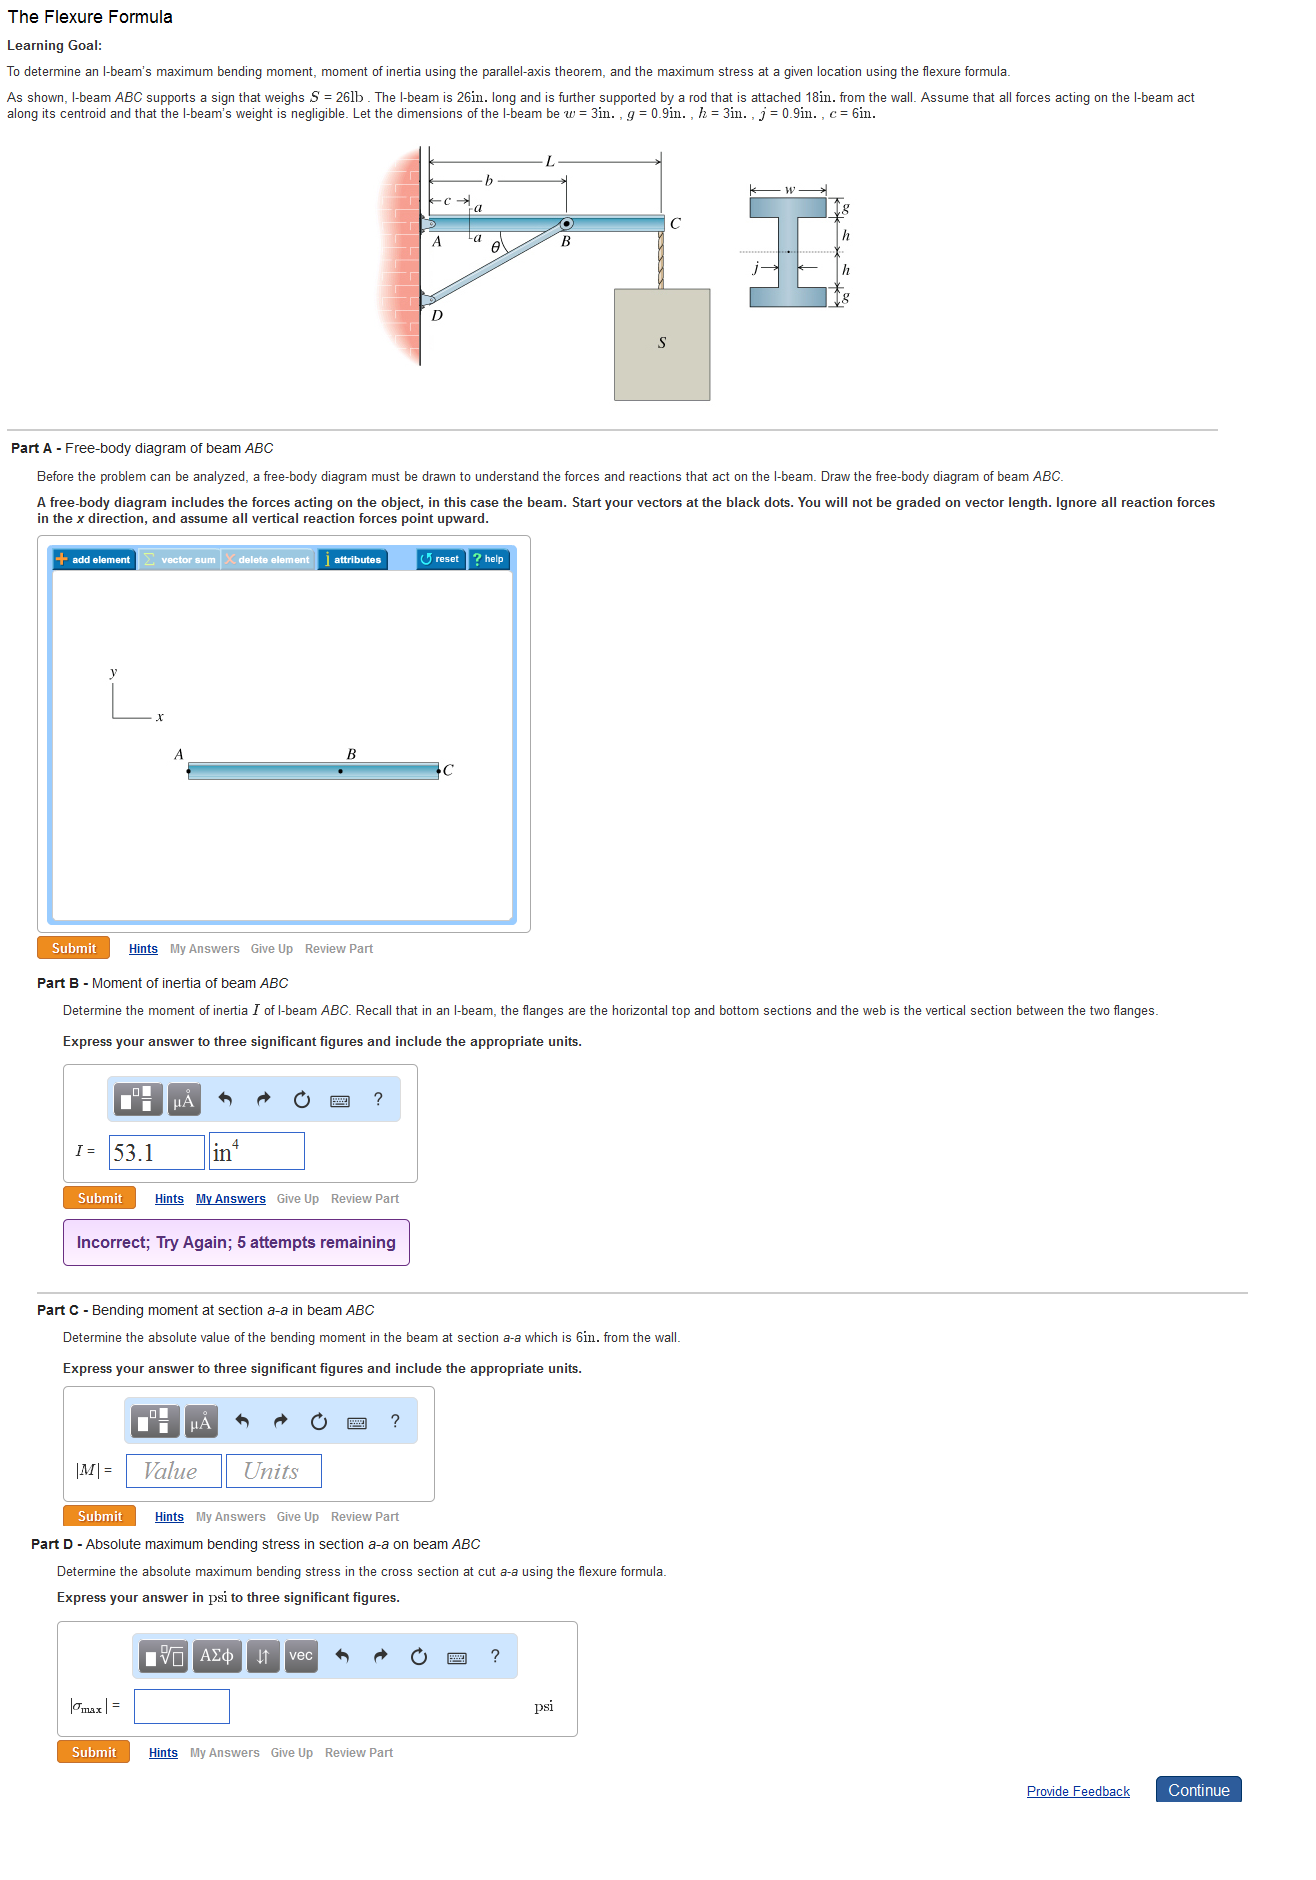 Solved: To Determine An I-beam❝s Maximum Bending Moment, M